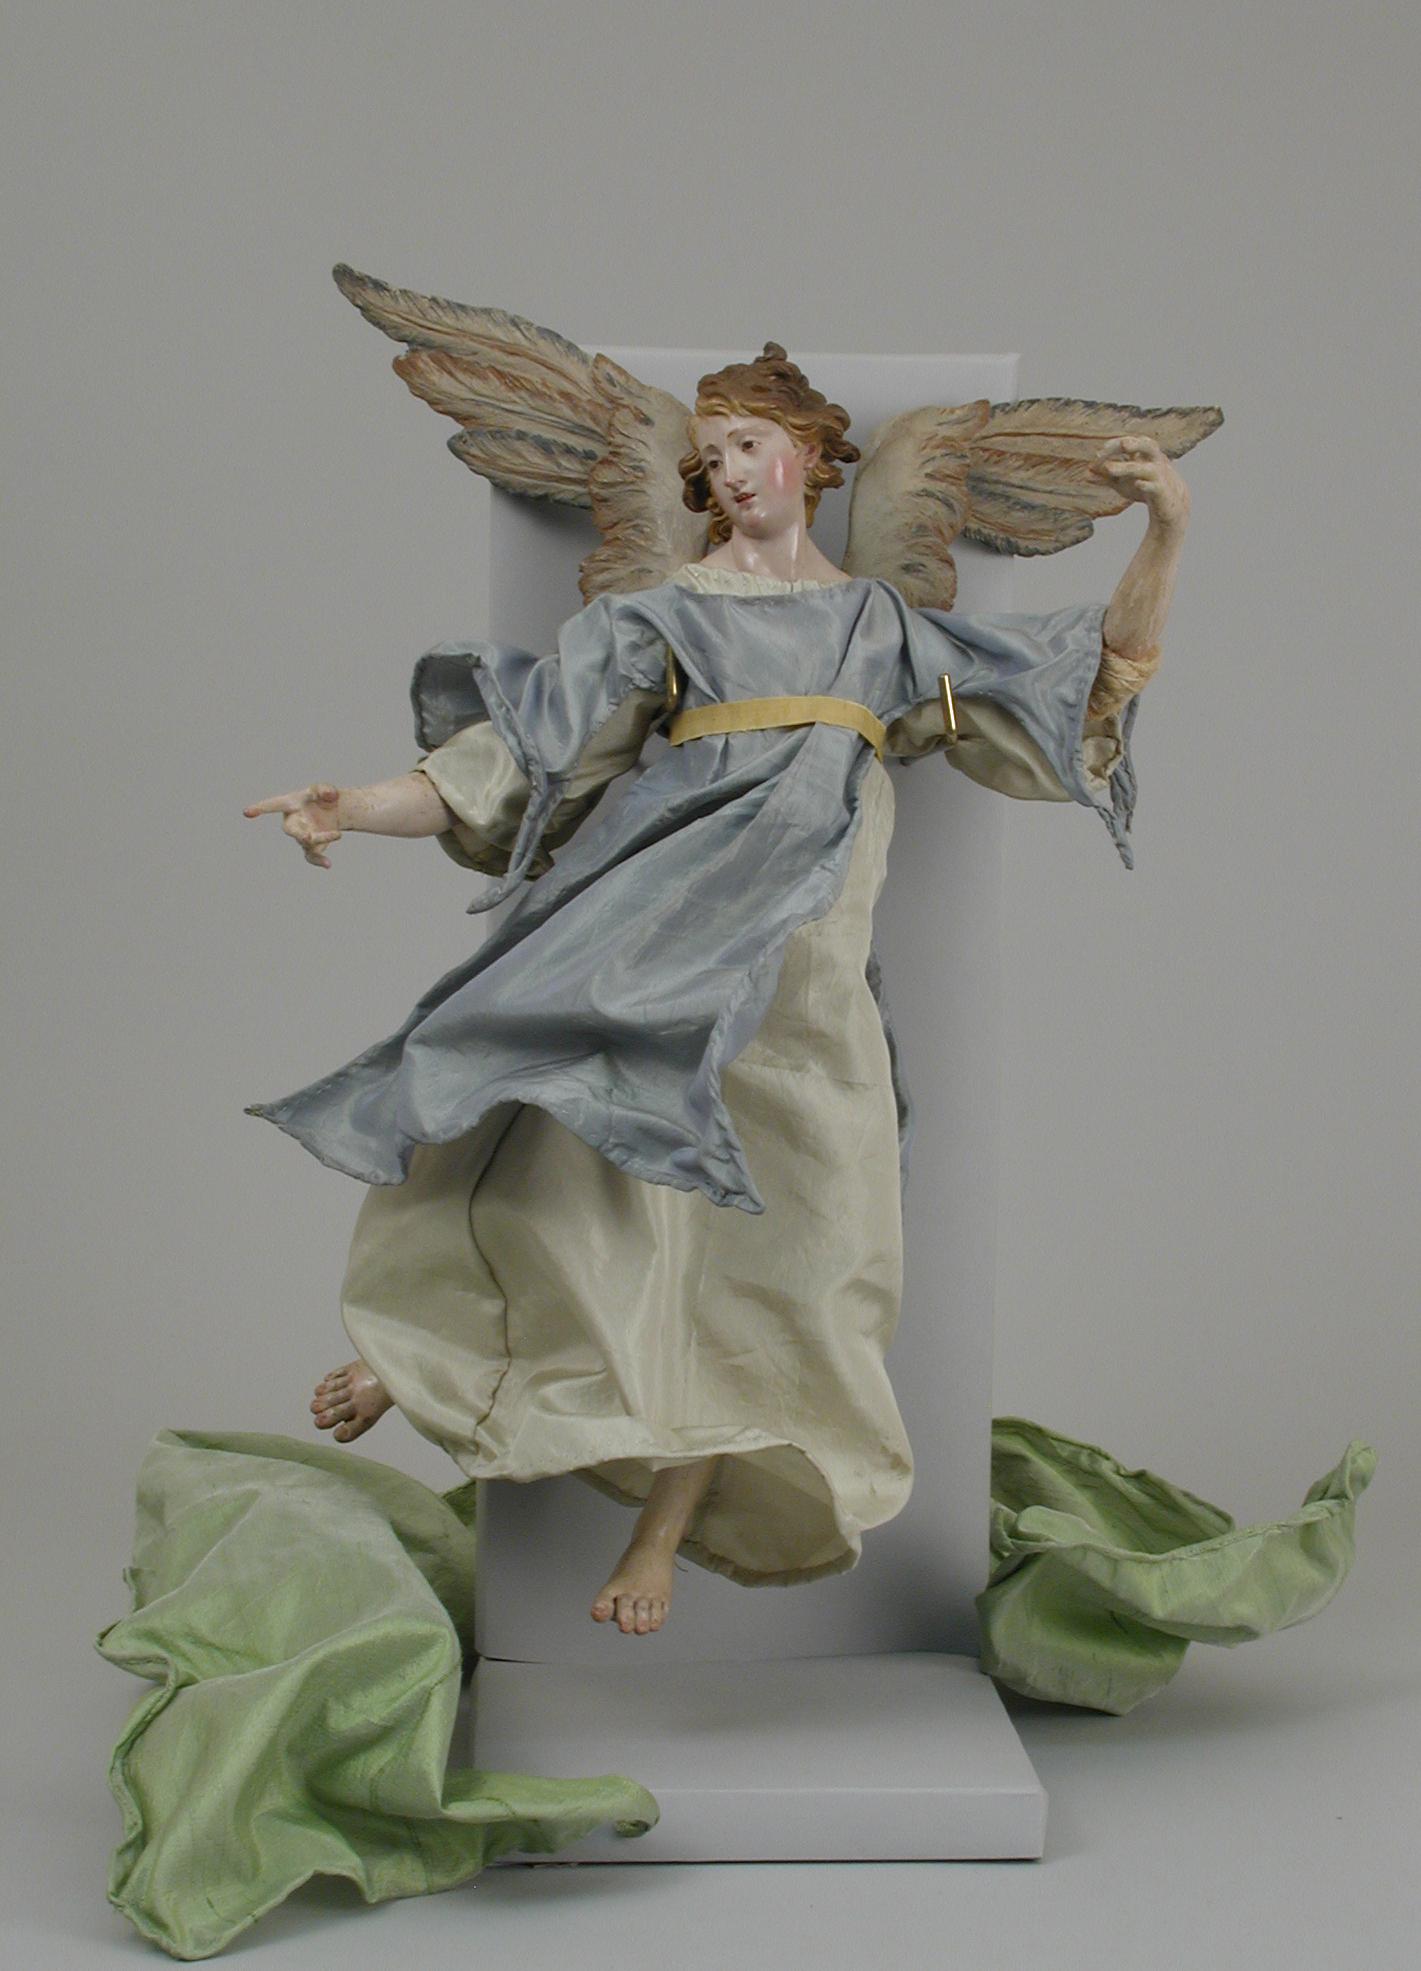 https://images.metmuseum.org/CRDImages/es/original/LC-69_294_16.jpg